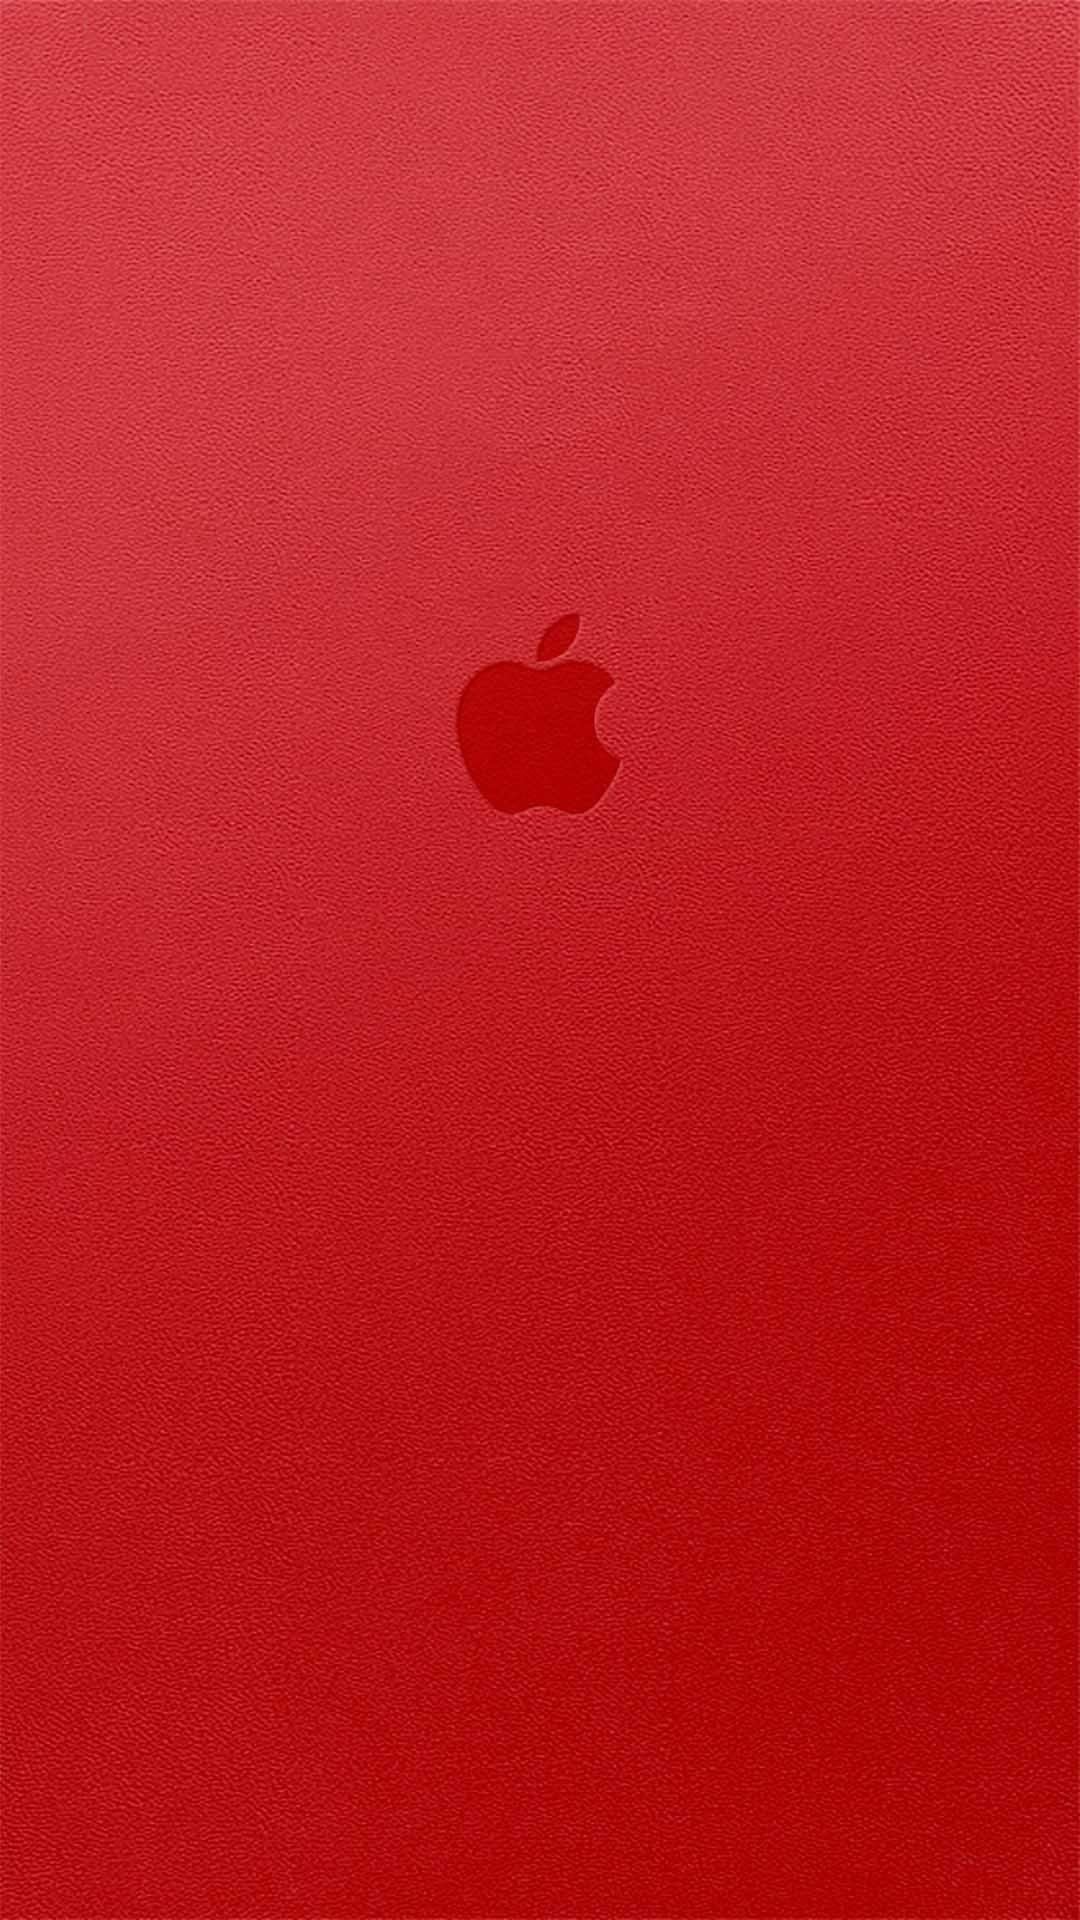 Red Iphone Wallpaper Iphone壁紙 ロゴ 壁紙 おしゃれな壁紙背景